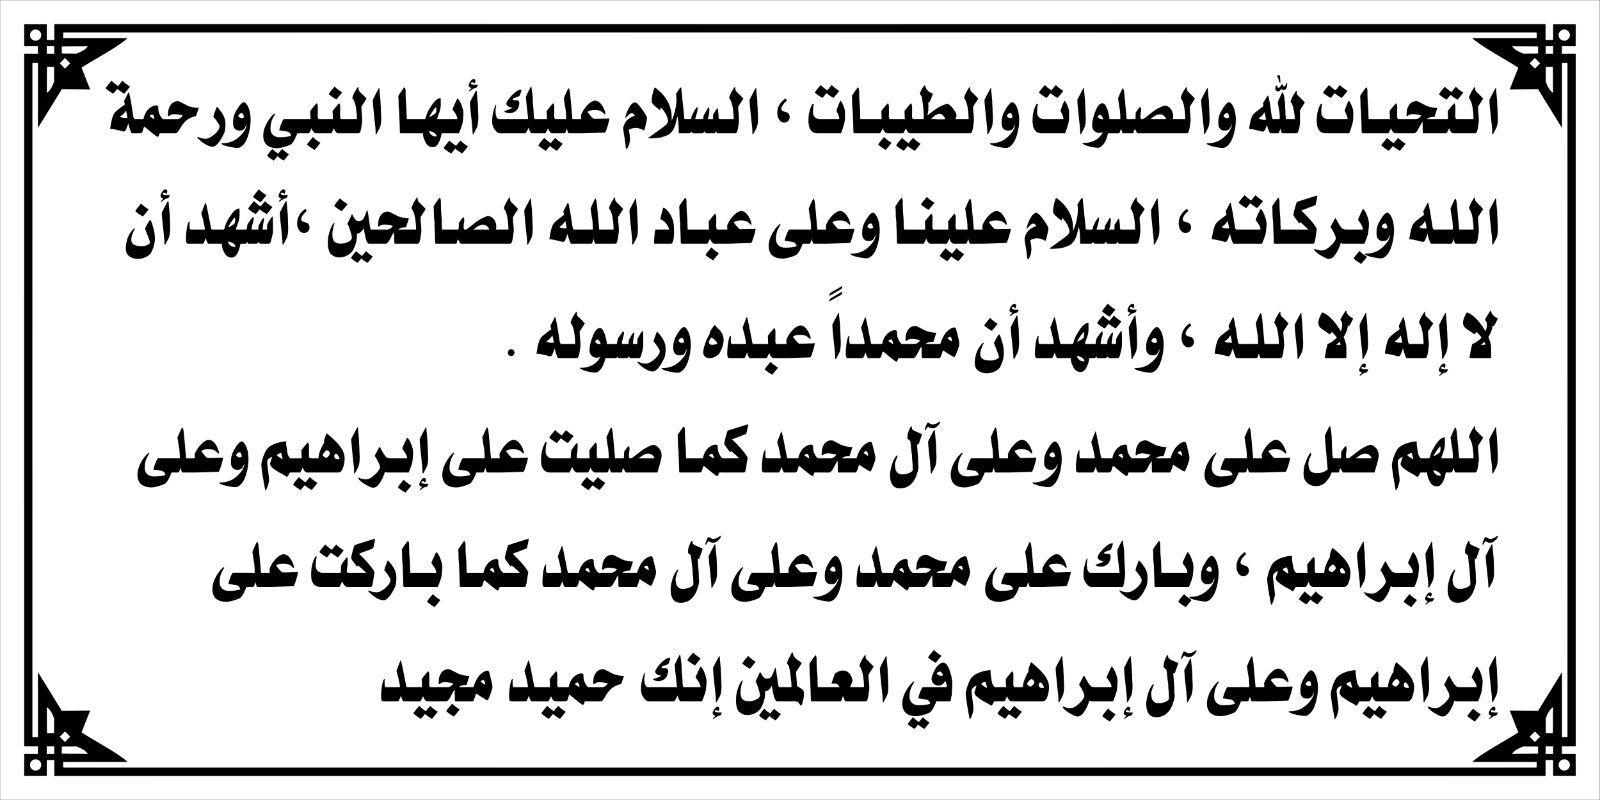 التشهد كامله للصلاة Islamic Quotes Peace Quotes